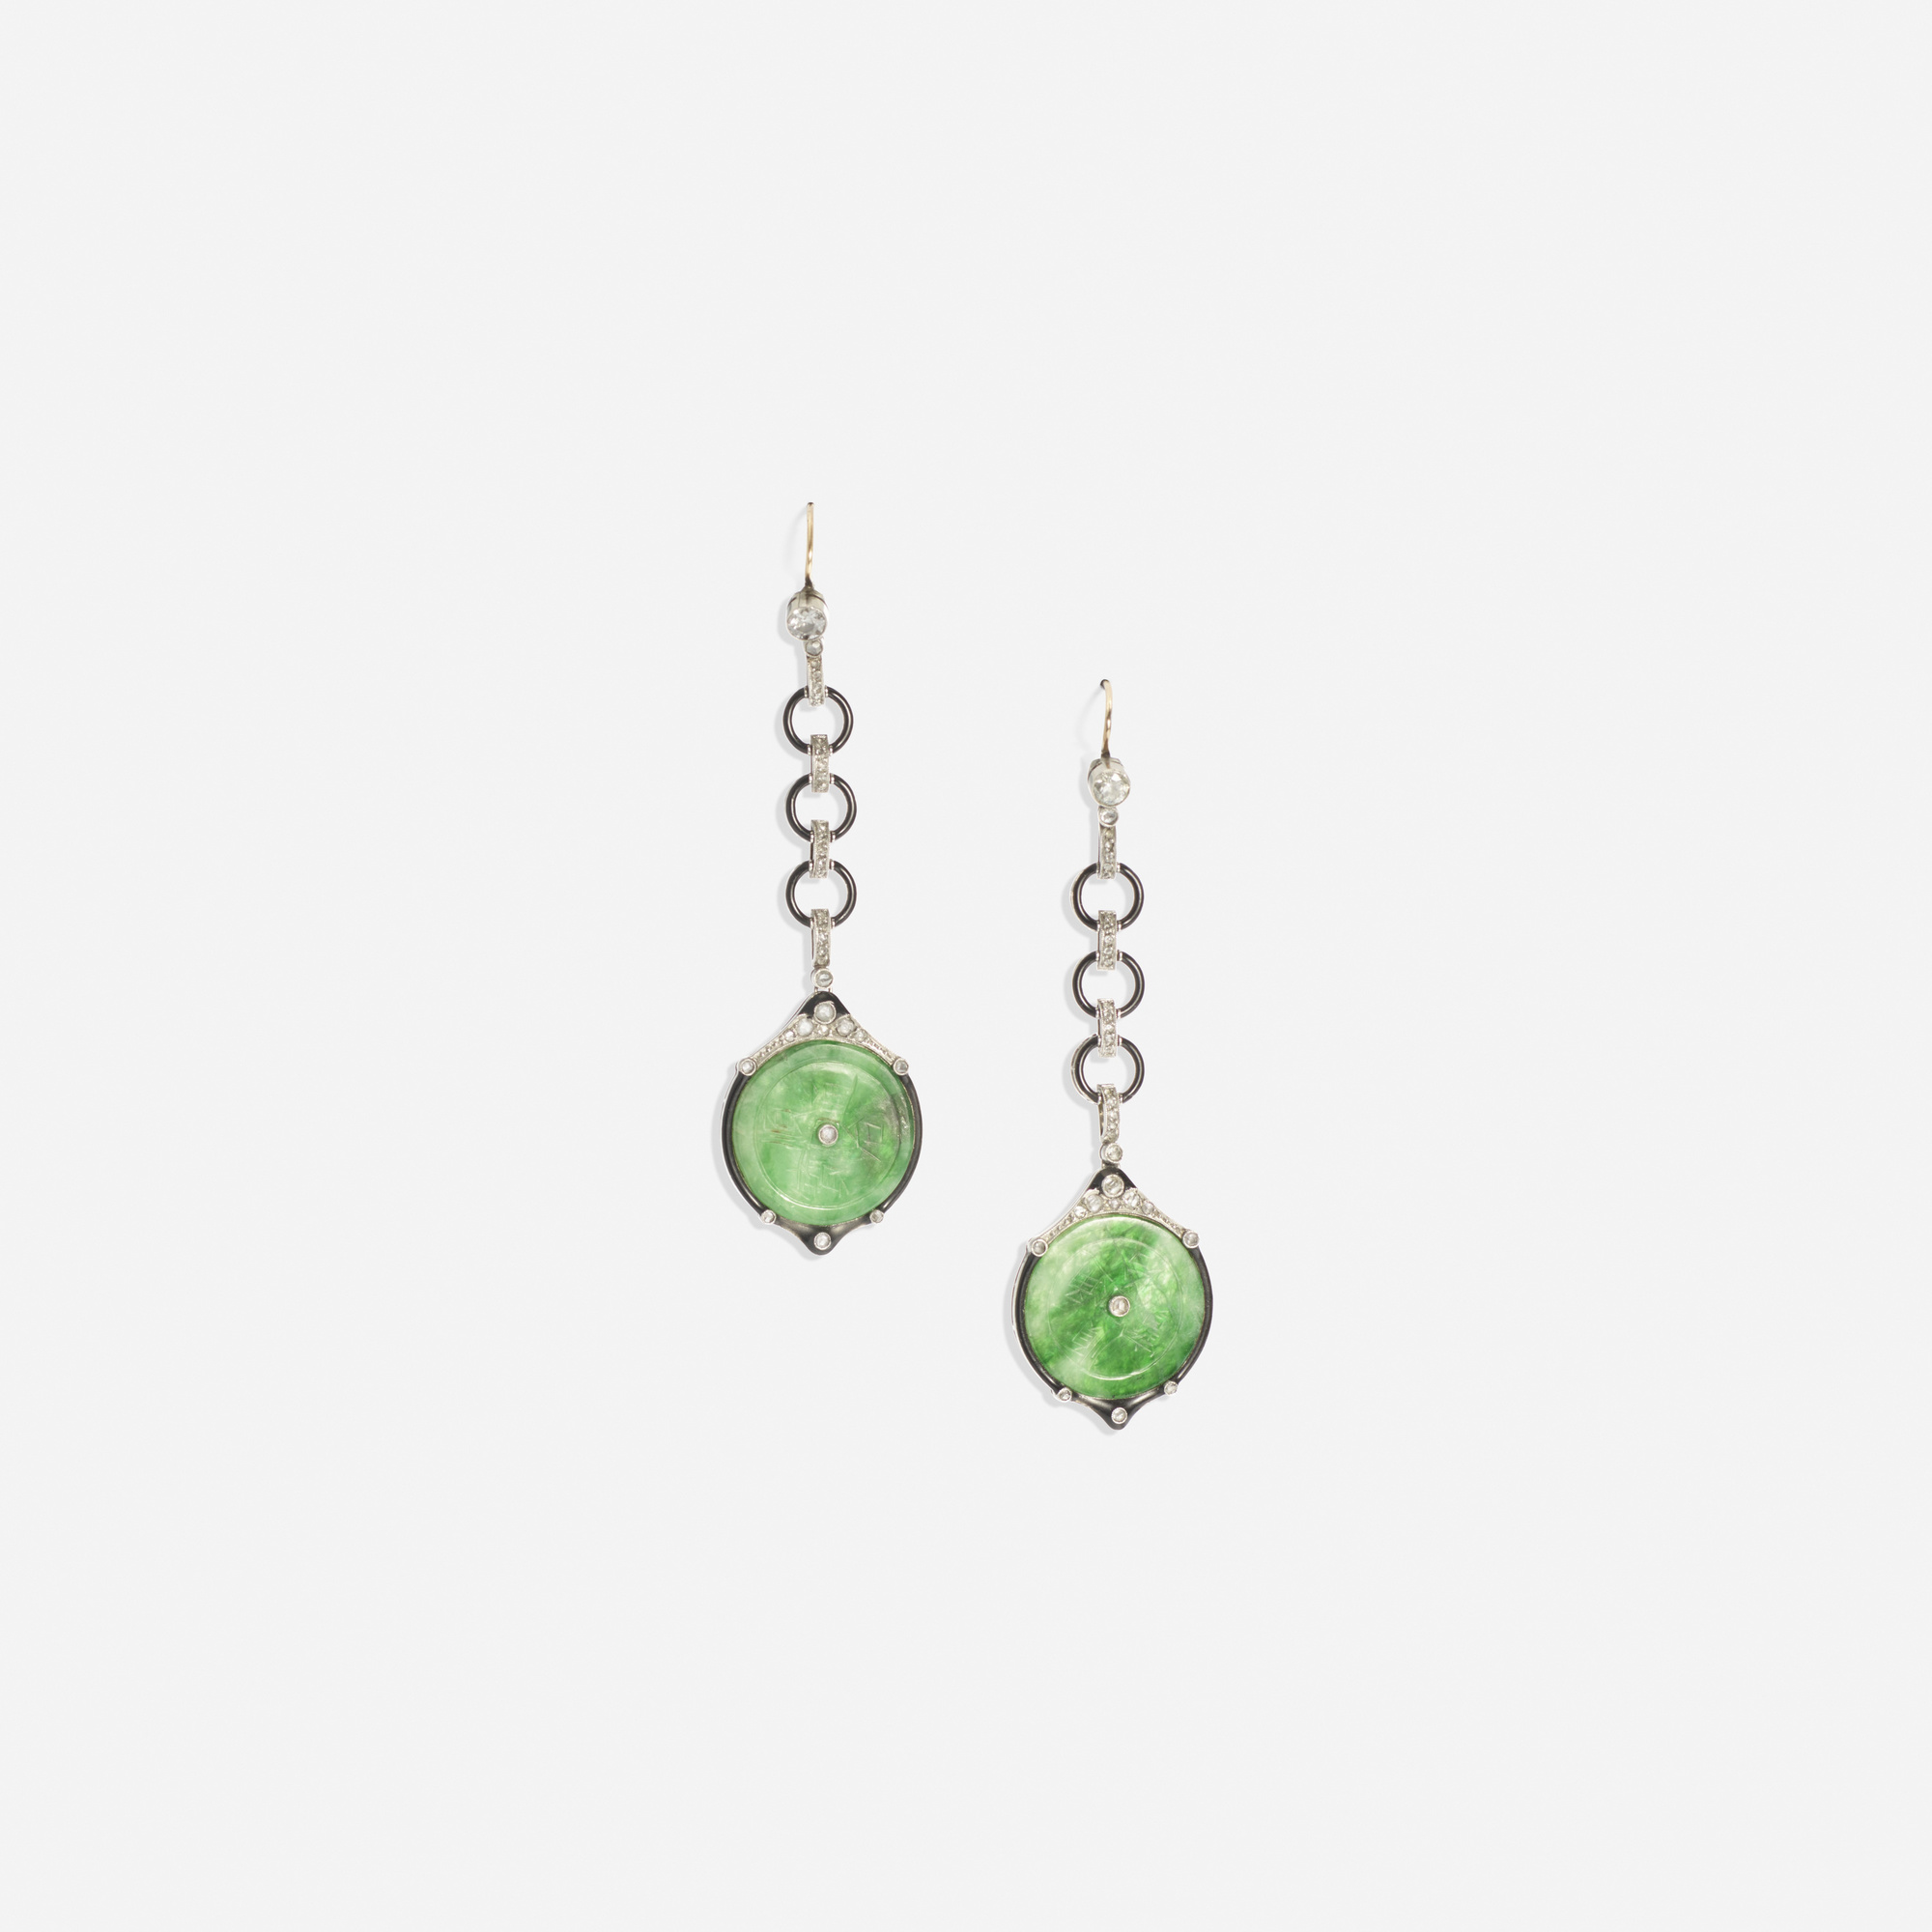 131: Art Deco / A pair of platinum, onyx, jade and diamond earrings (1 of 1)